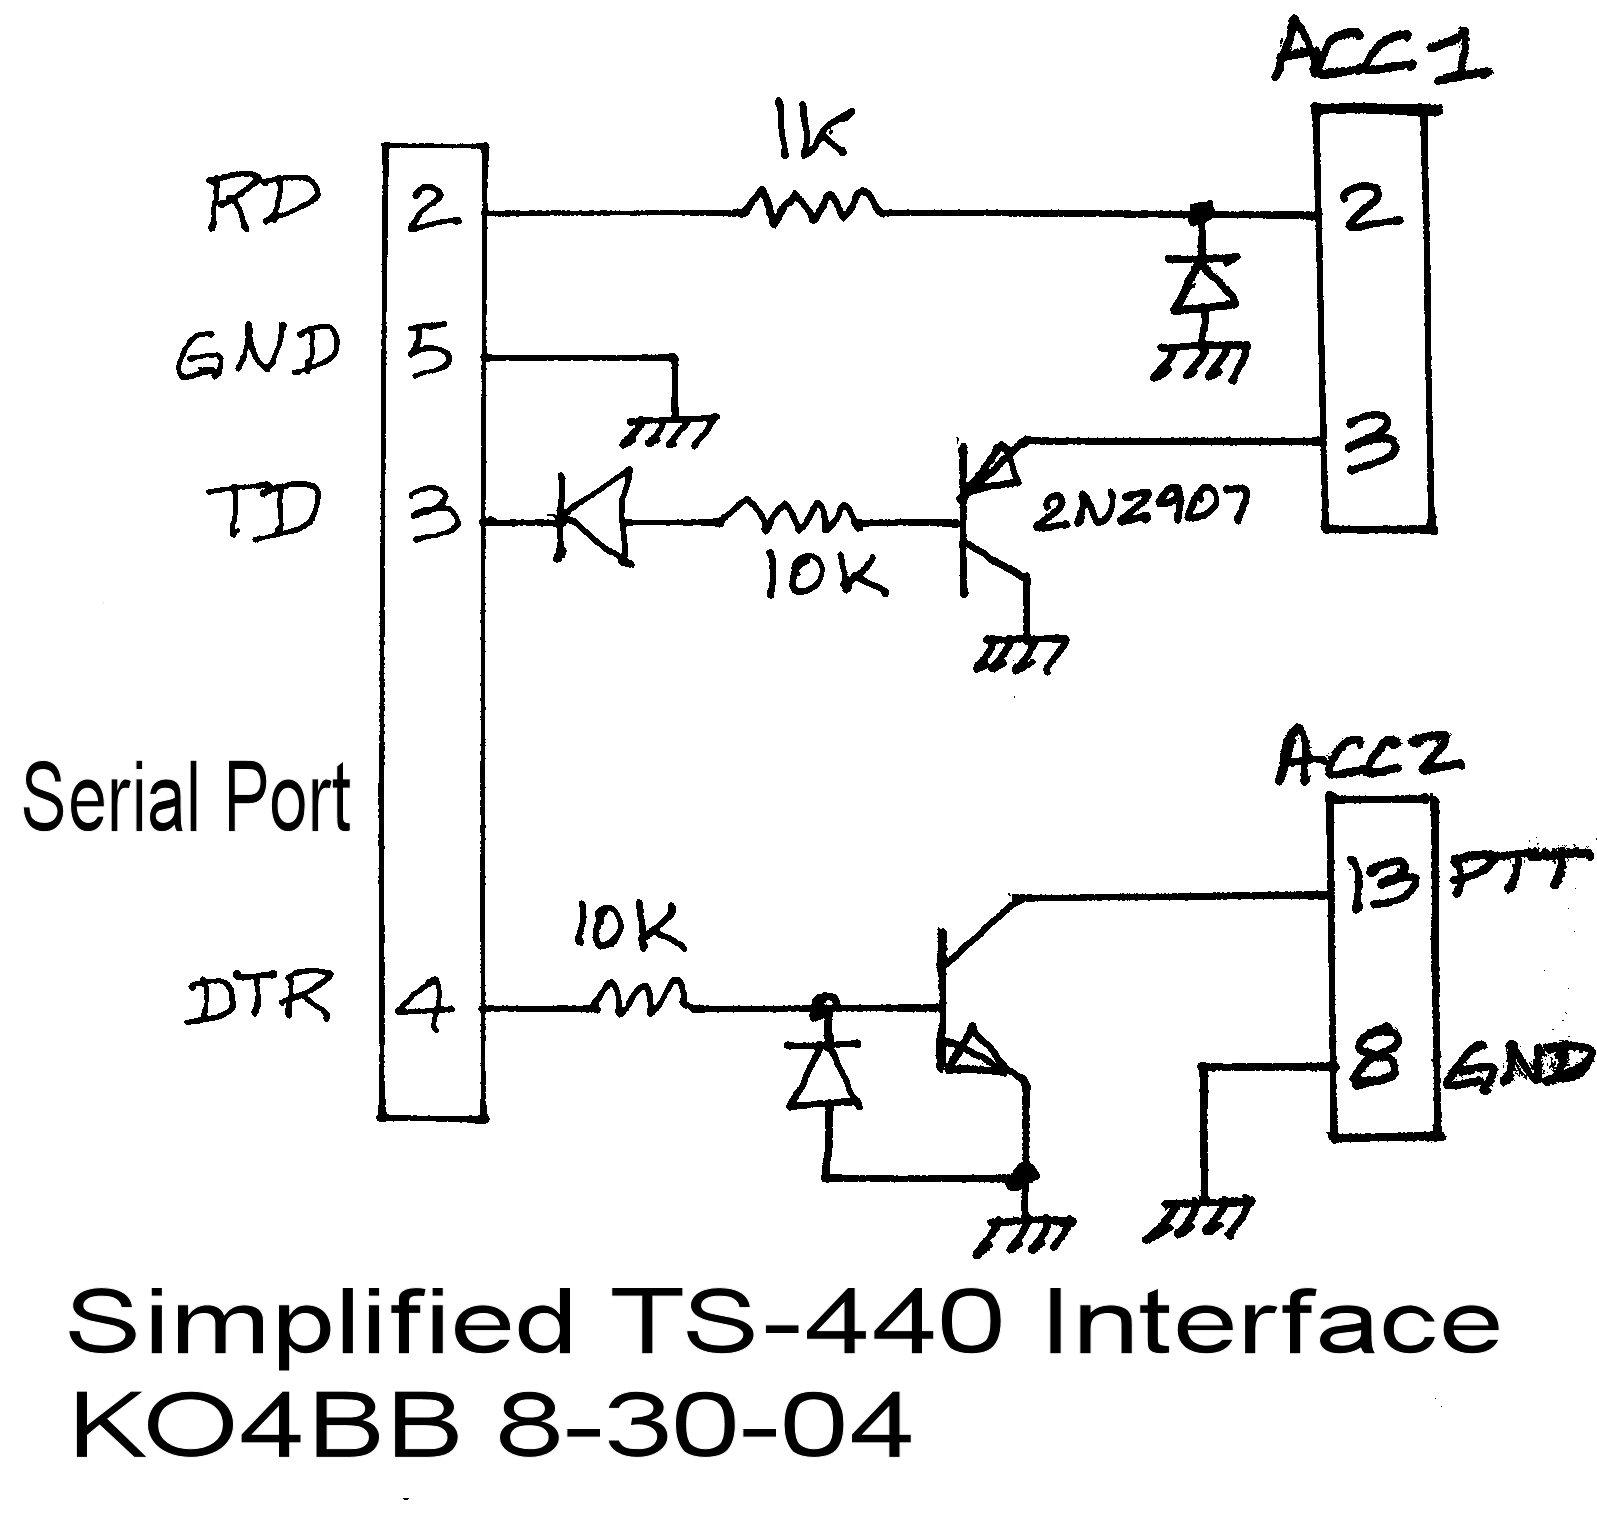 KO4BB's TS-440 Interface